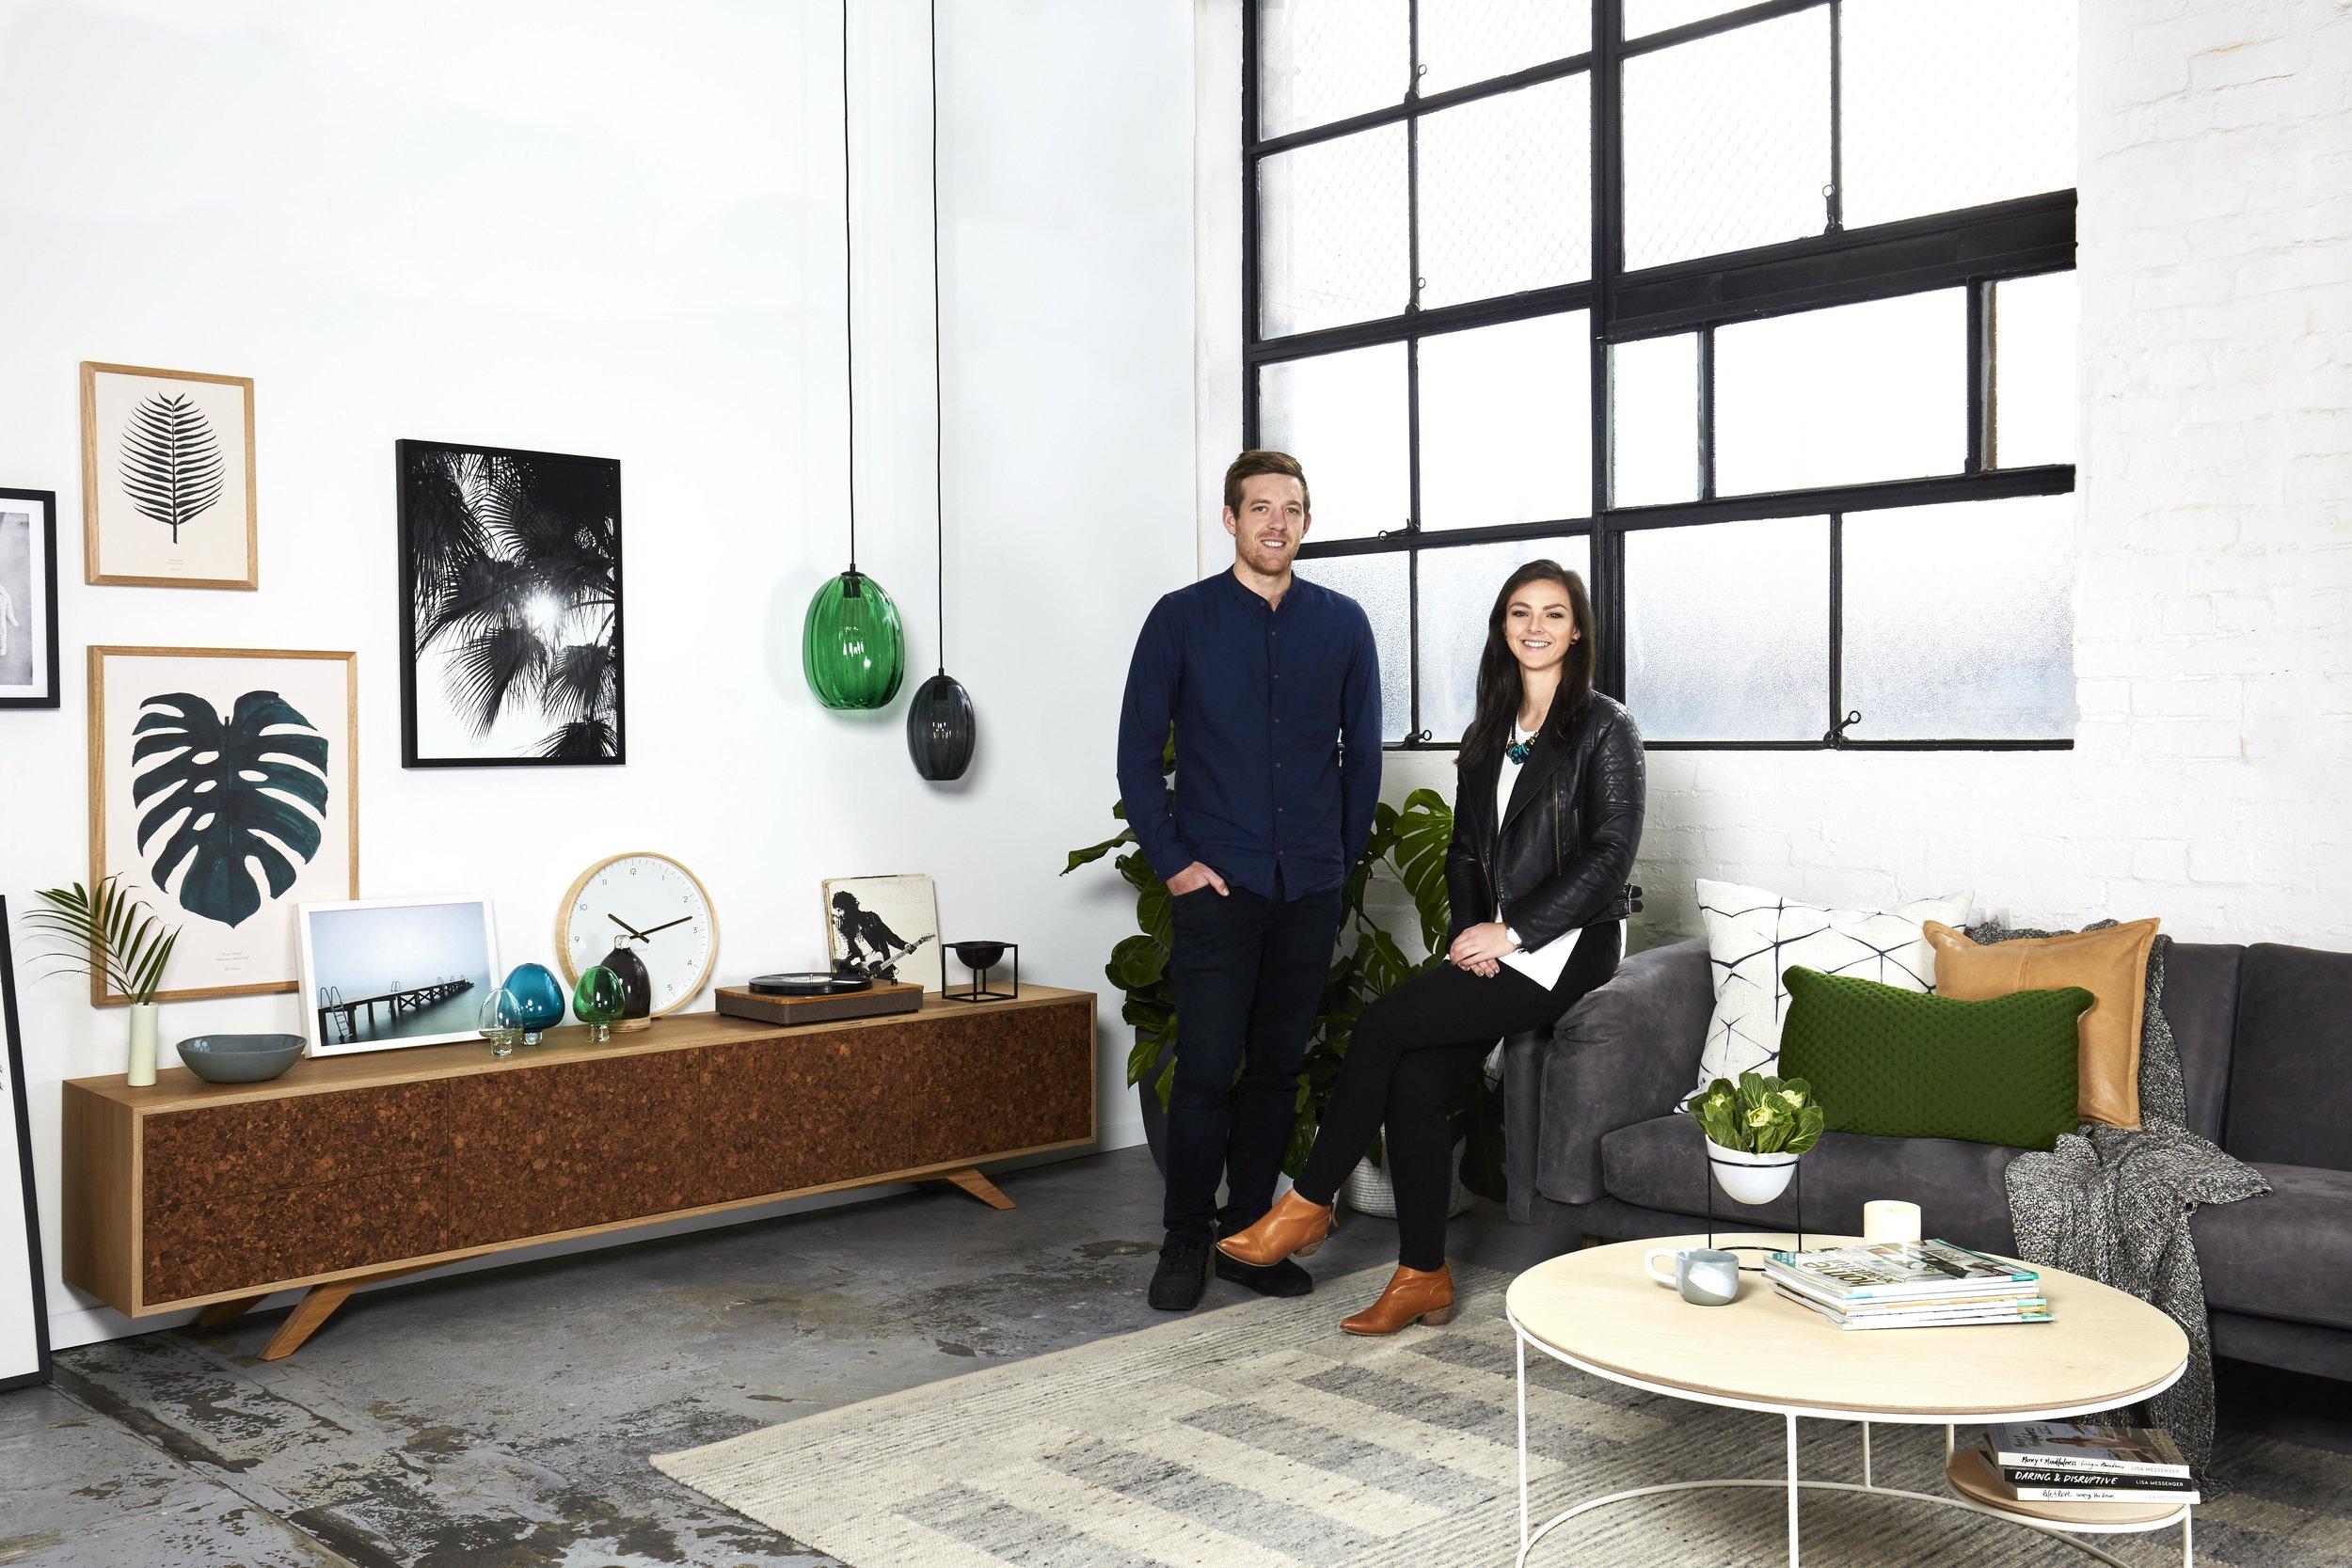 Maitland Street Interiors, Sarah Elshaug, Interior Stylist Melbourne, Antonia Morrongiello, Ian Anderson